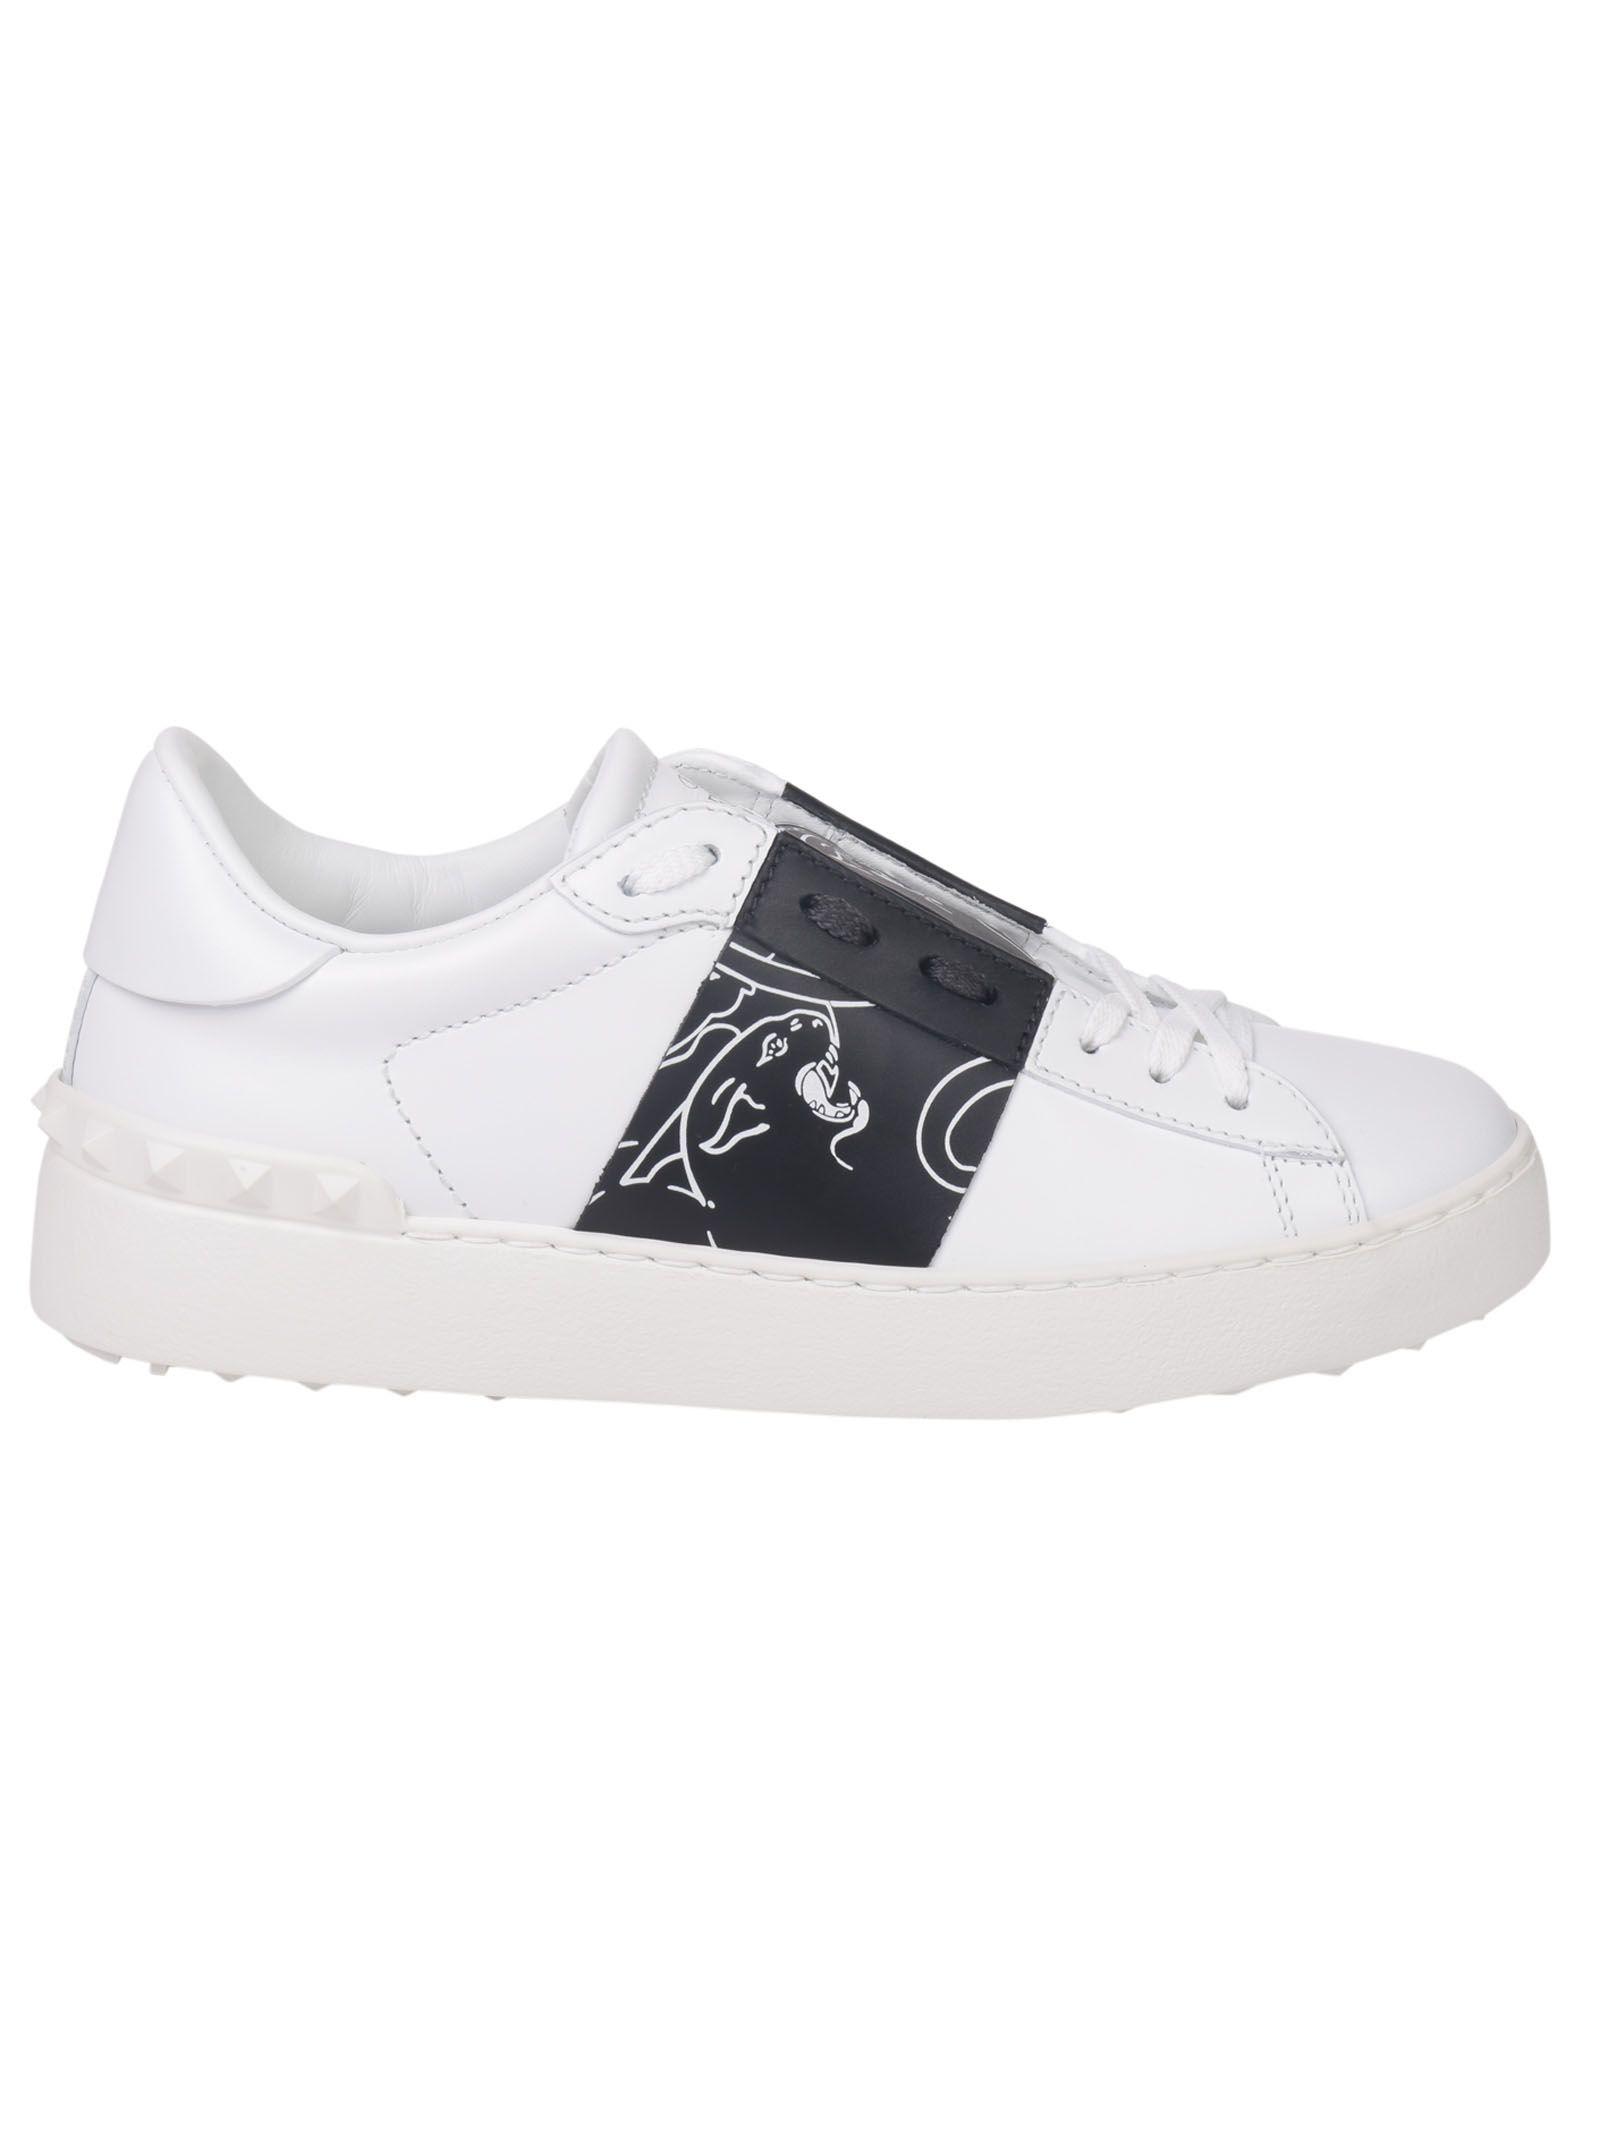 valentino garavani valentino garavani rockstud panther open sneakers nero bianco women 39 s. Black Bedroom Furniture Sets. Home Design Ideas